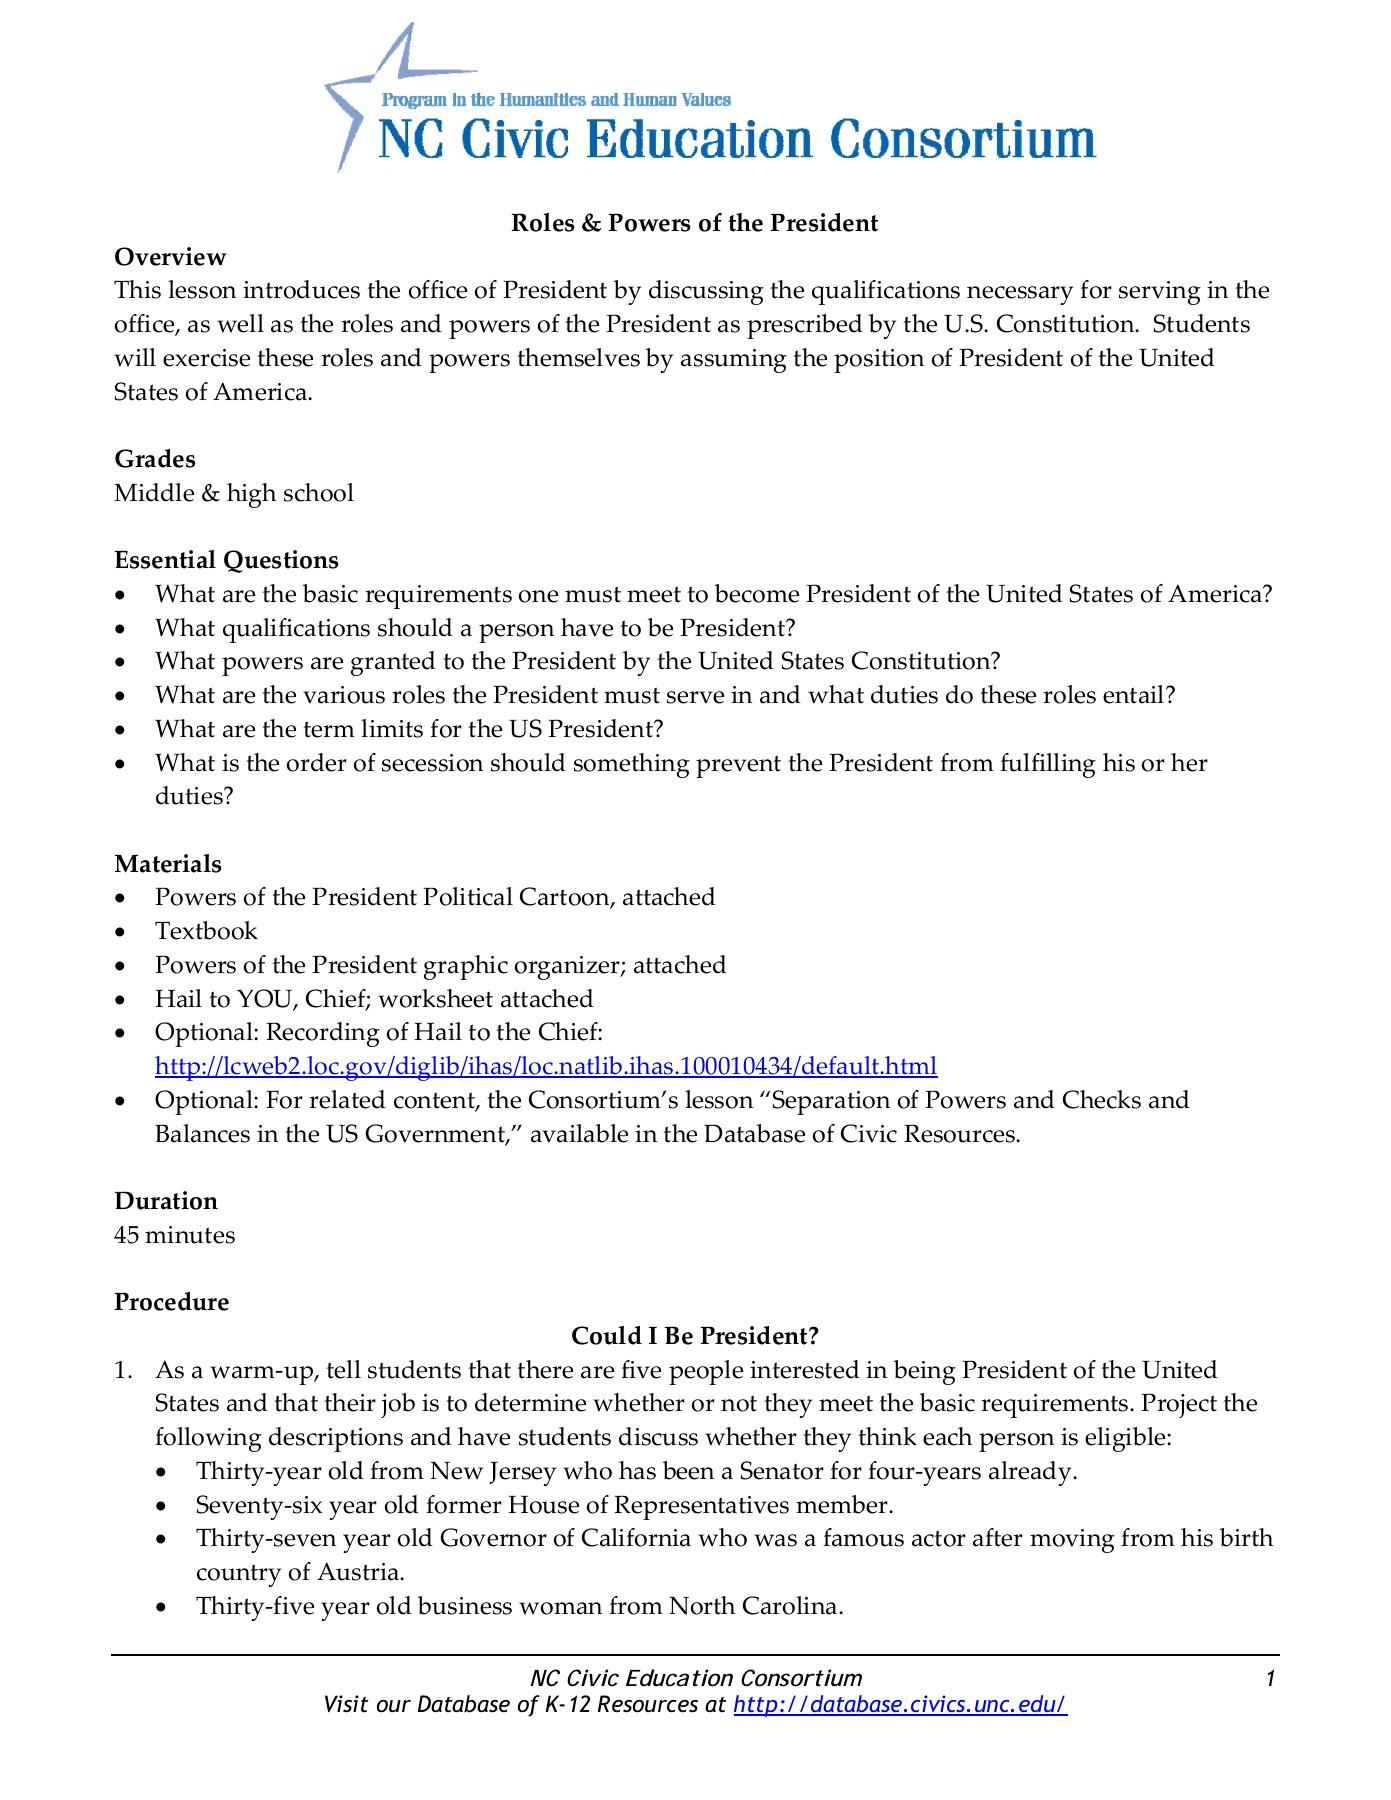 Checks and Balances Worksheet Answers